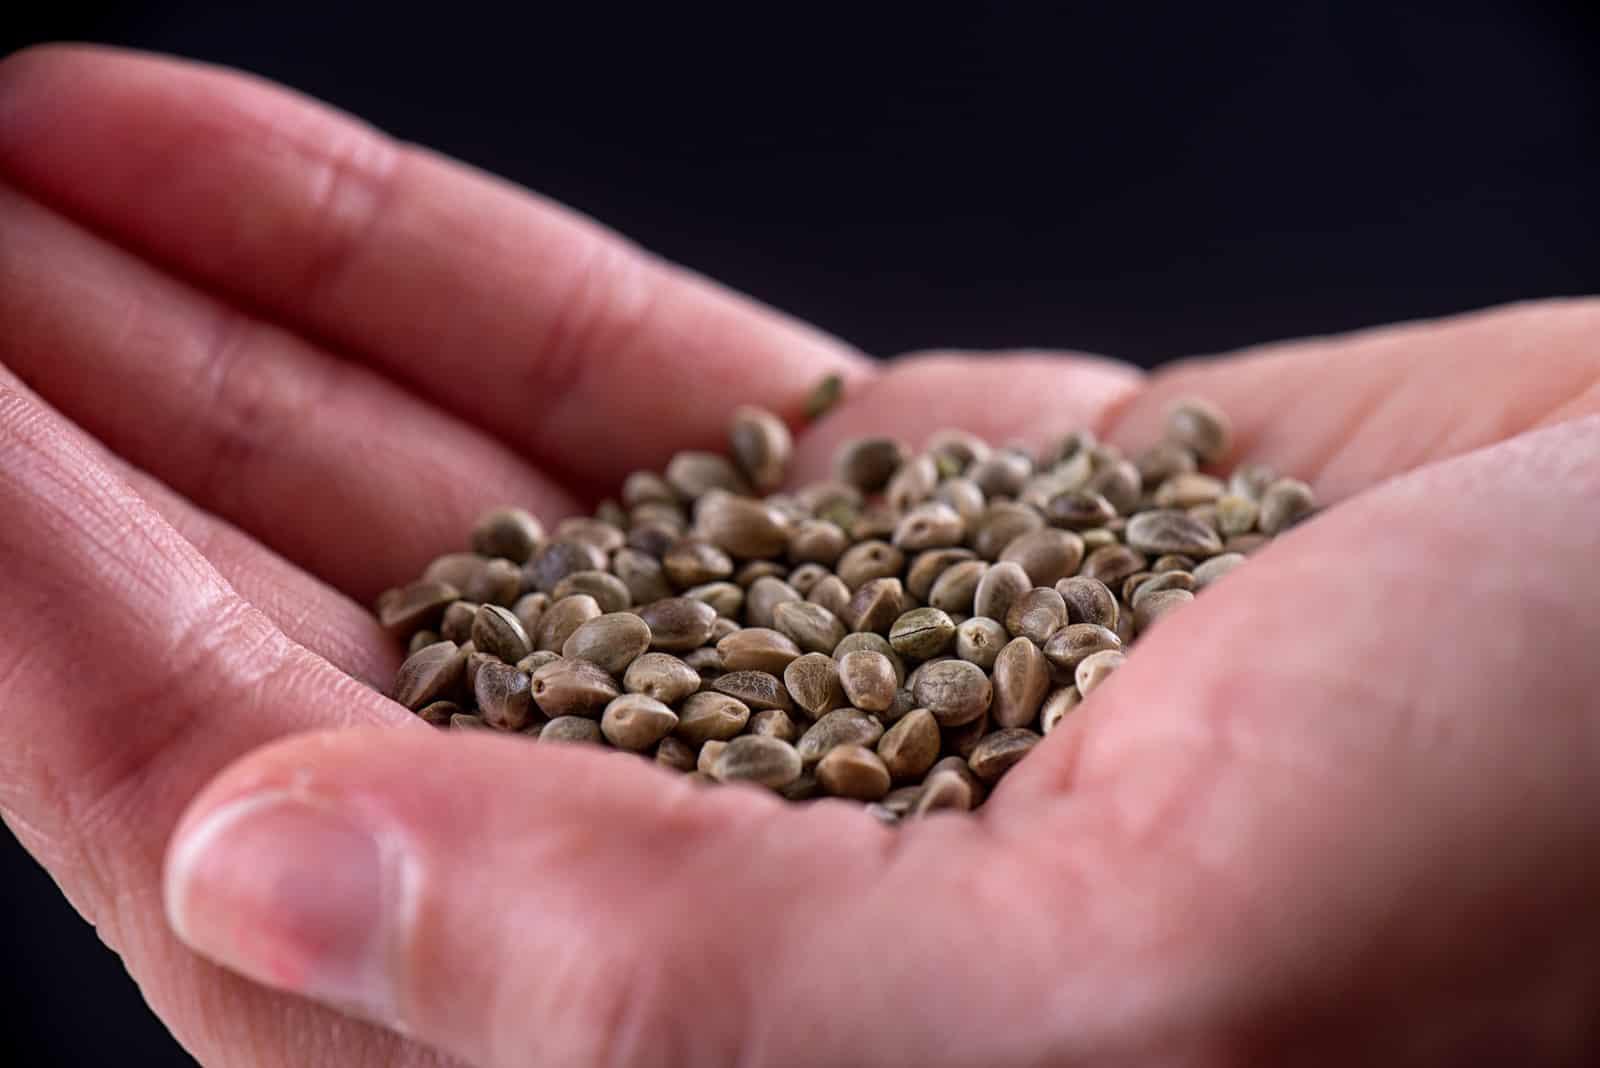 Marijauna Seed Banks That Ship to USA. Seeds in a palm.